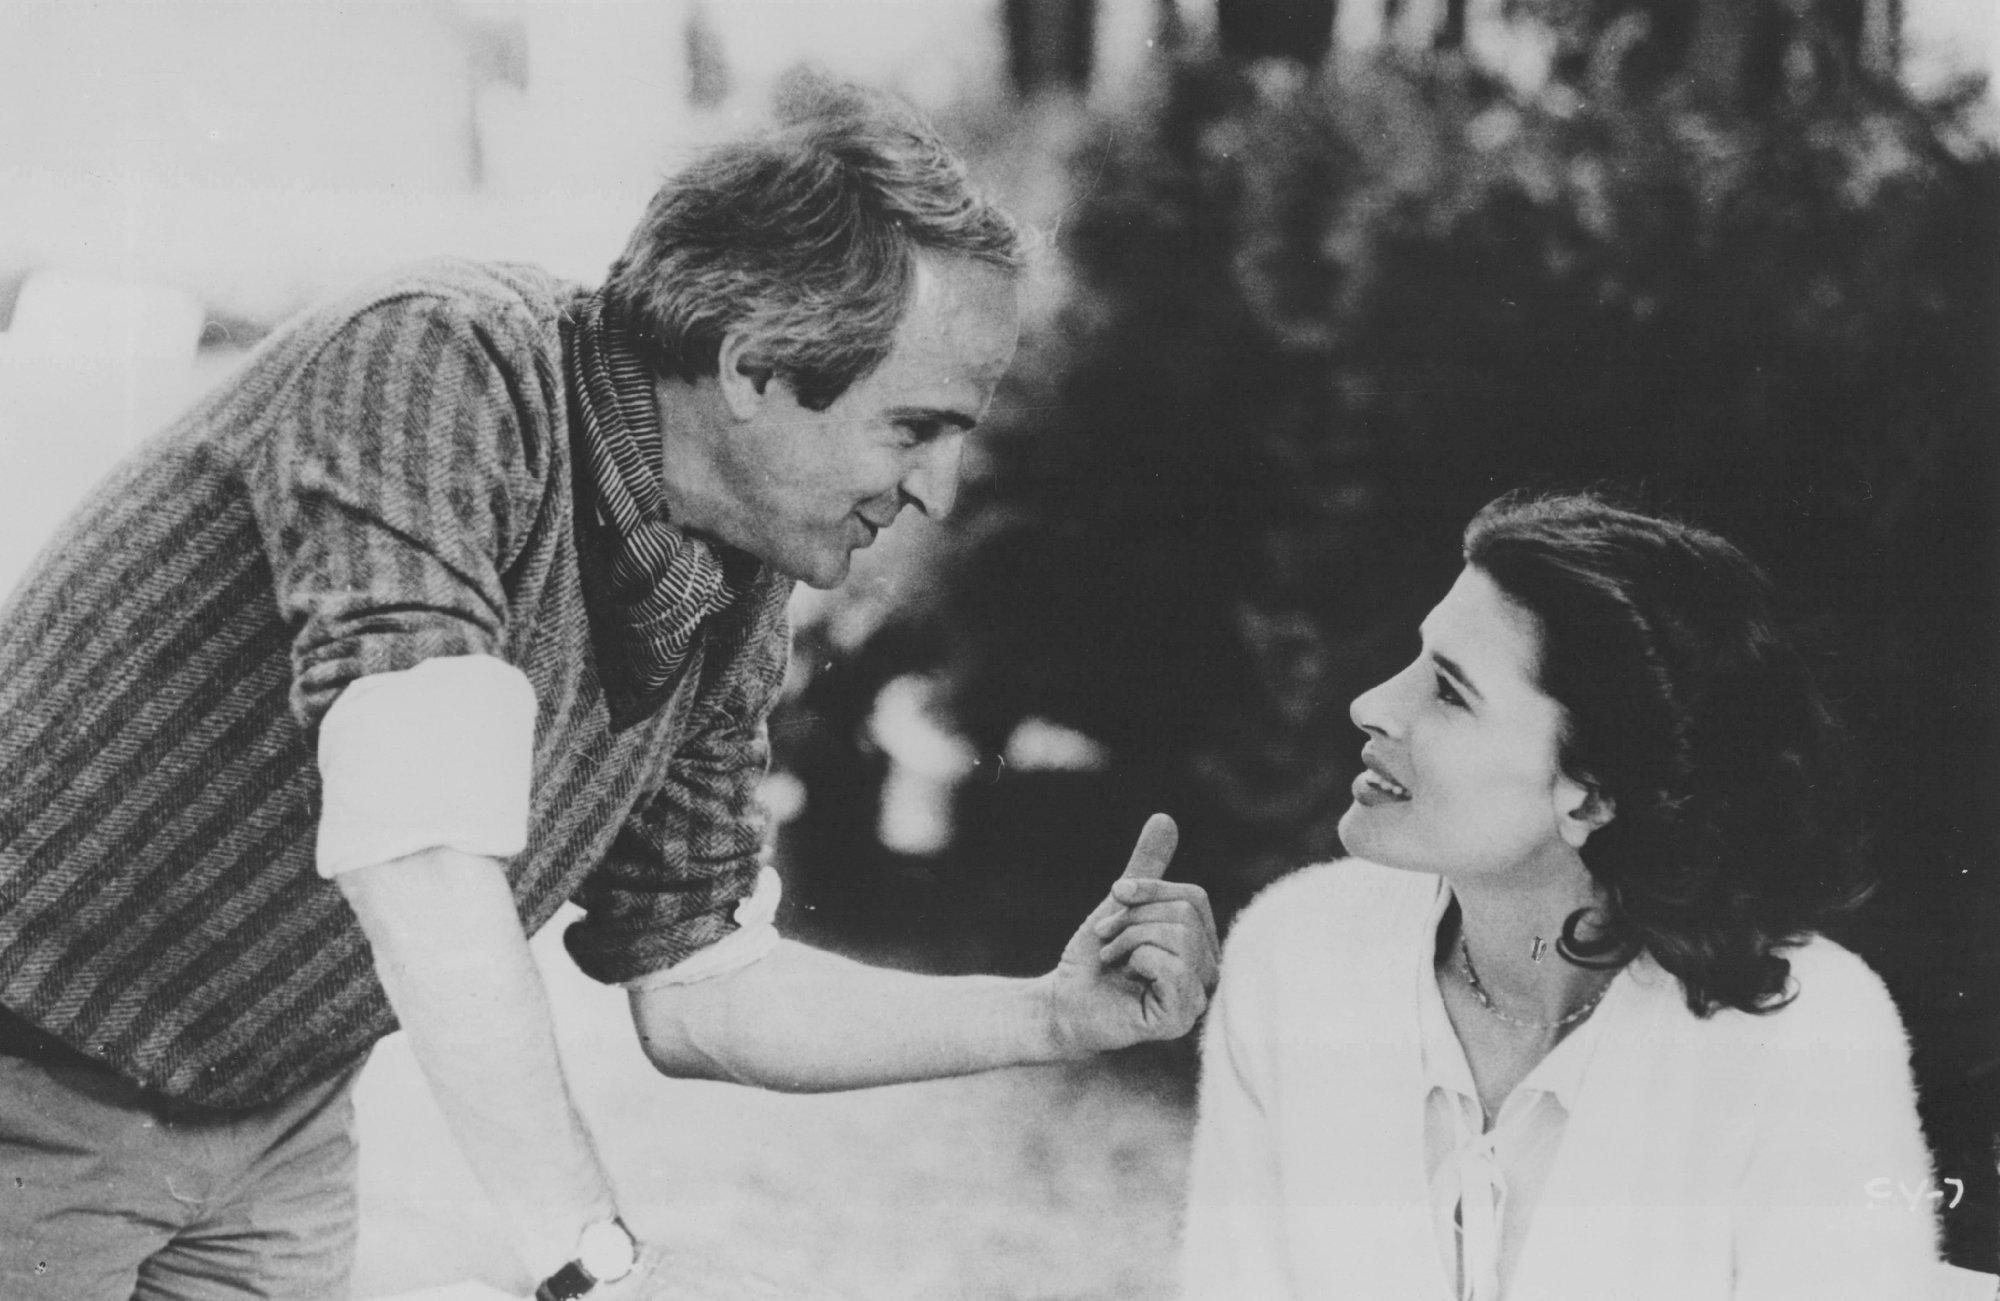 Francois Truffaut on the set of Confidentially Yours (1983, Le Films du Carrosse)